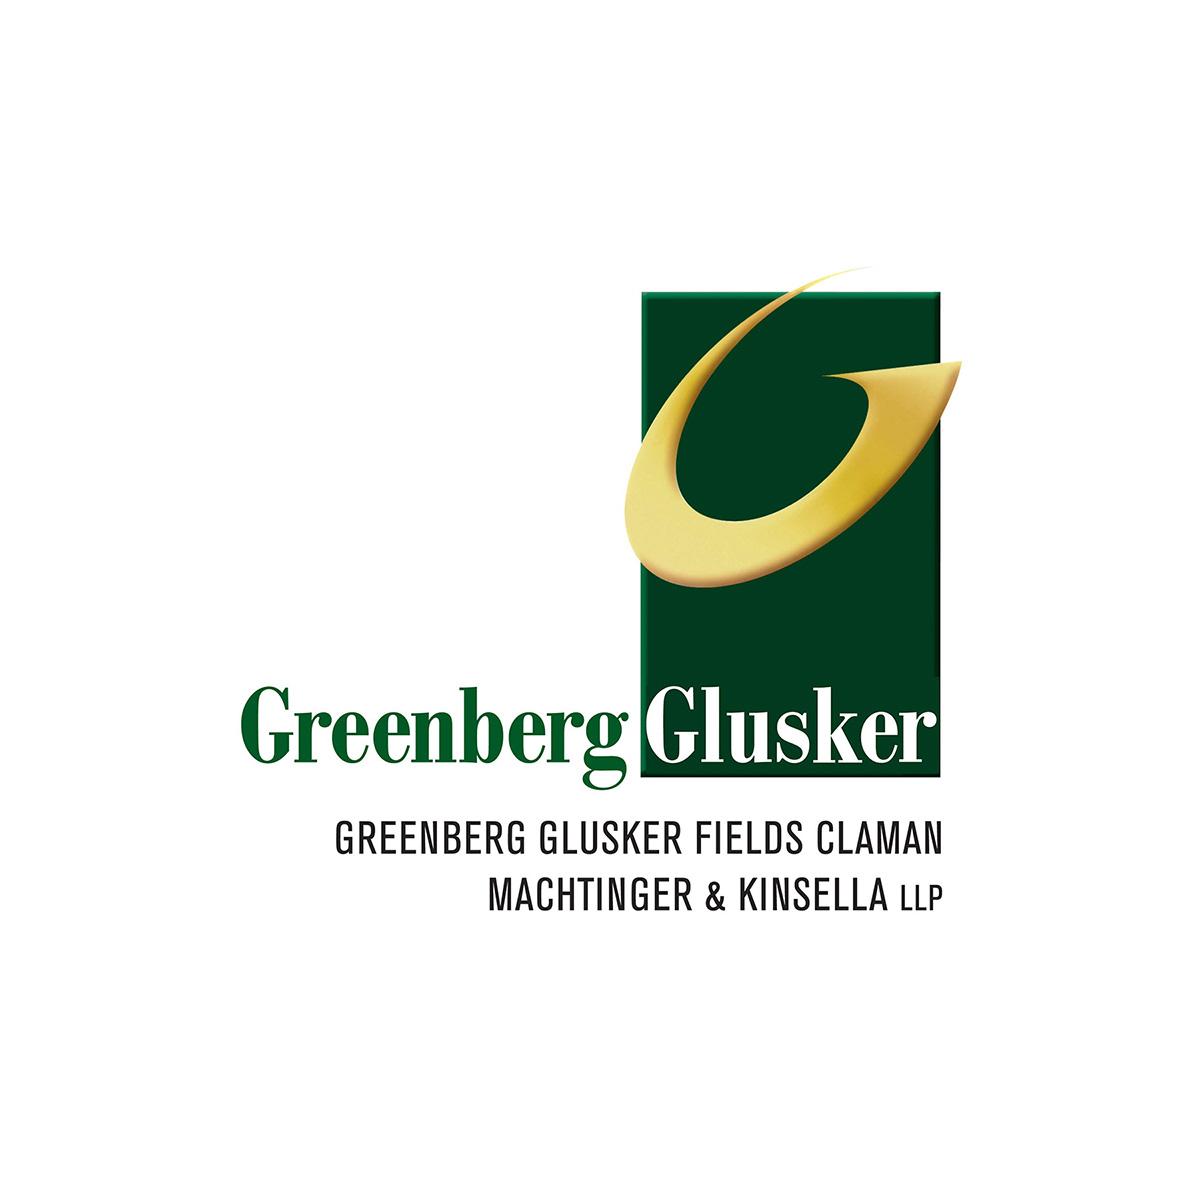 Greenberg Glusker, LLP